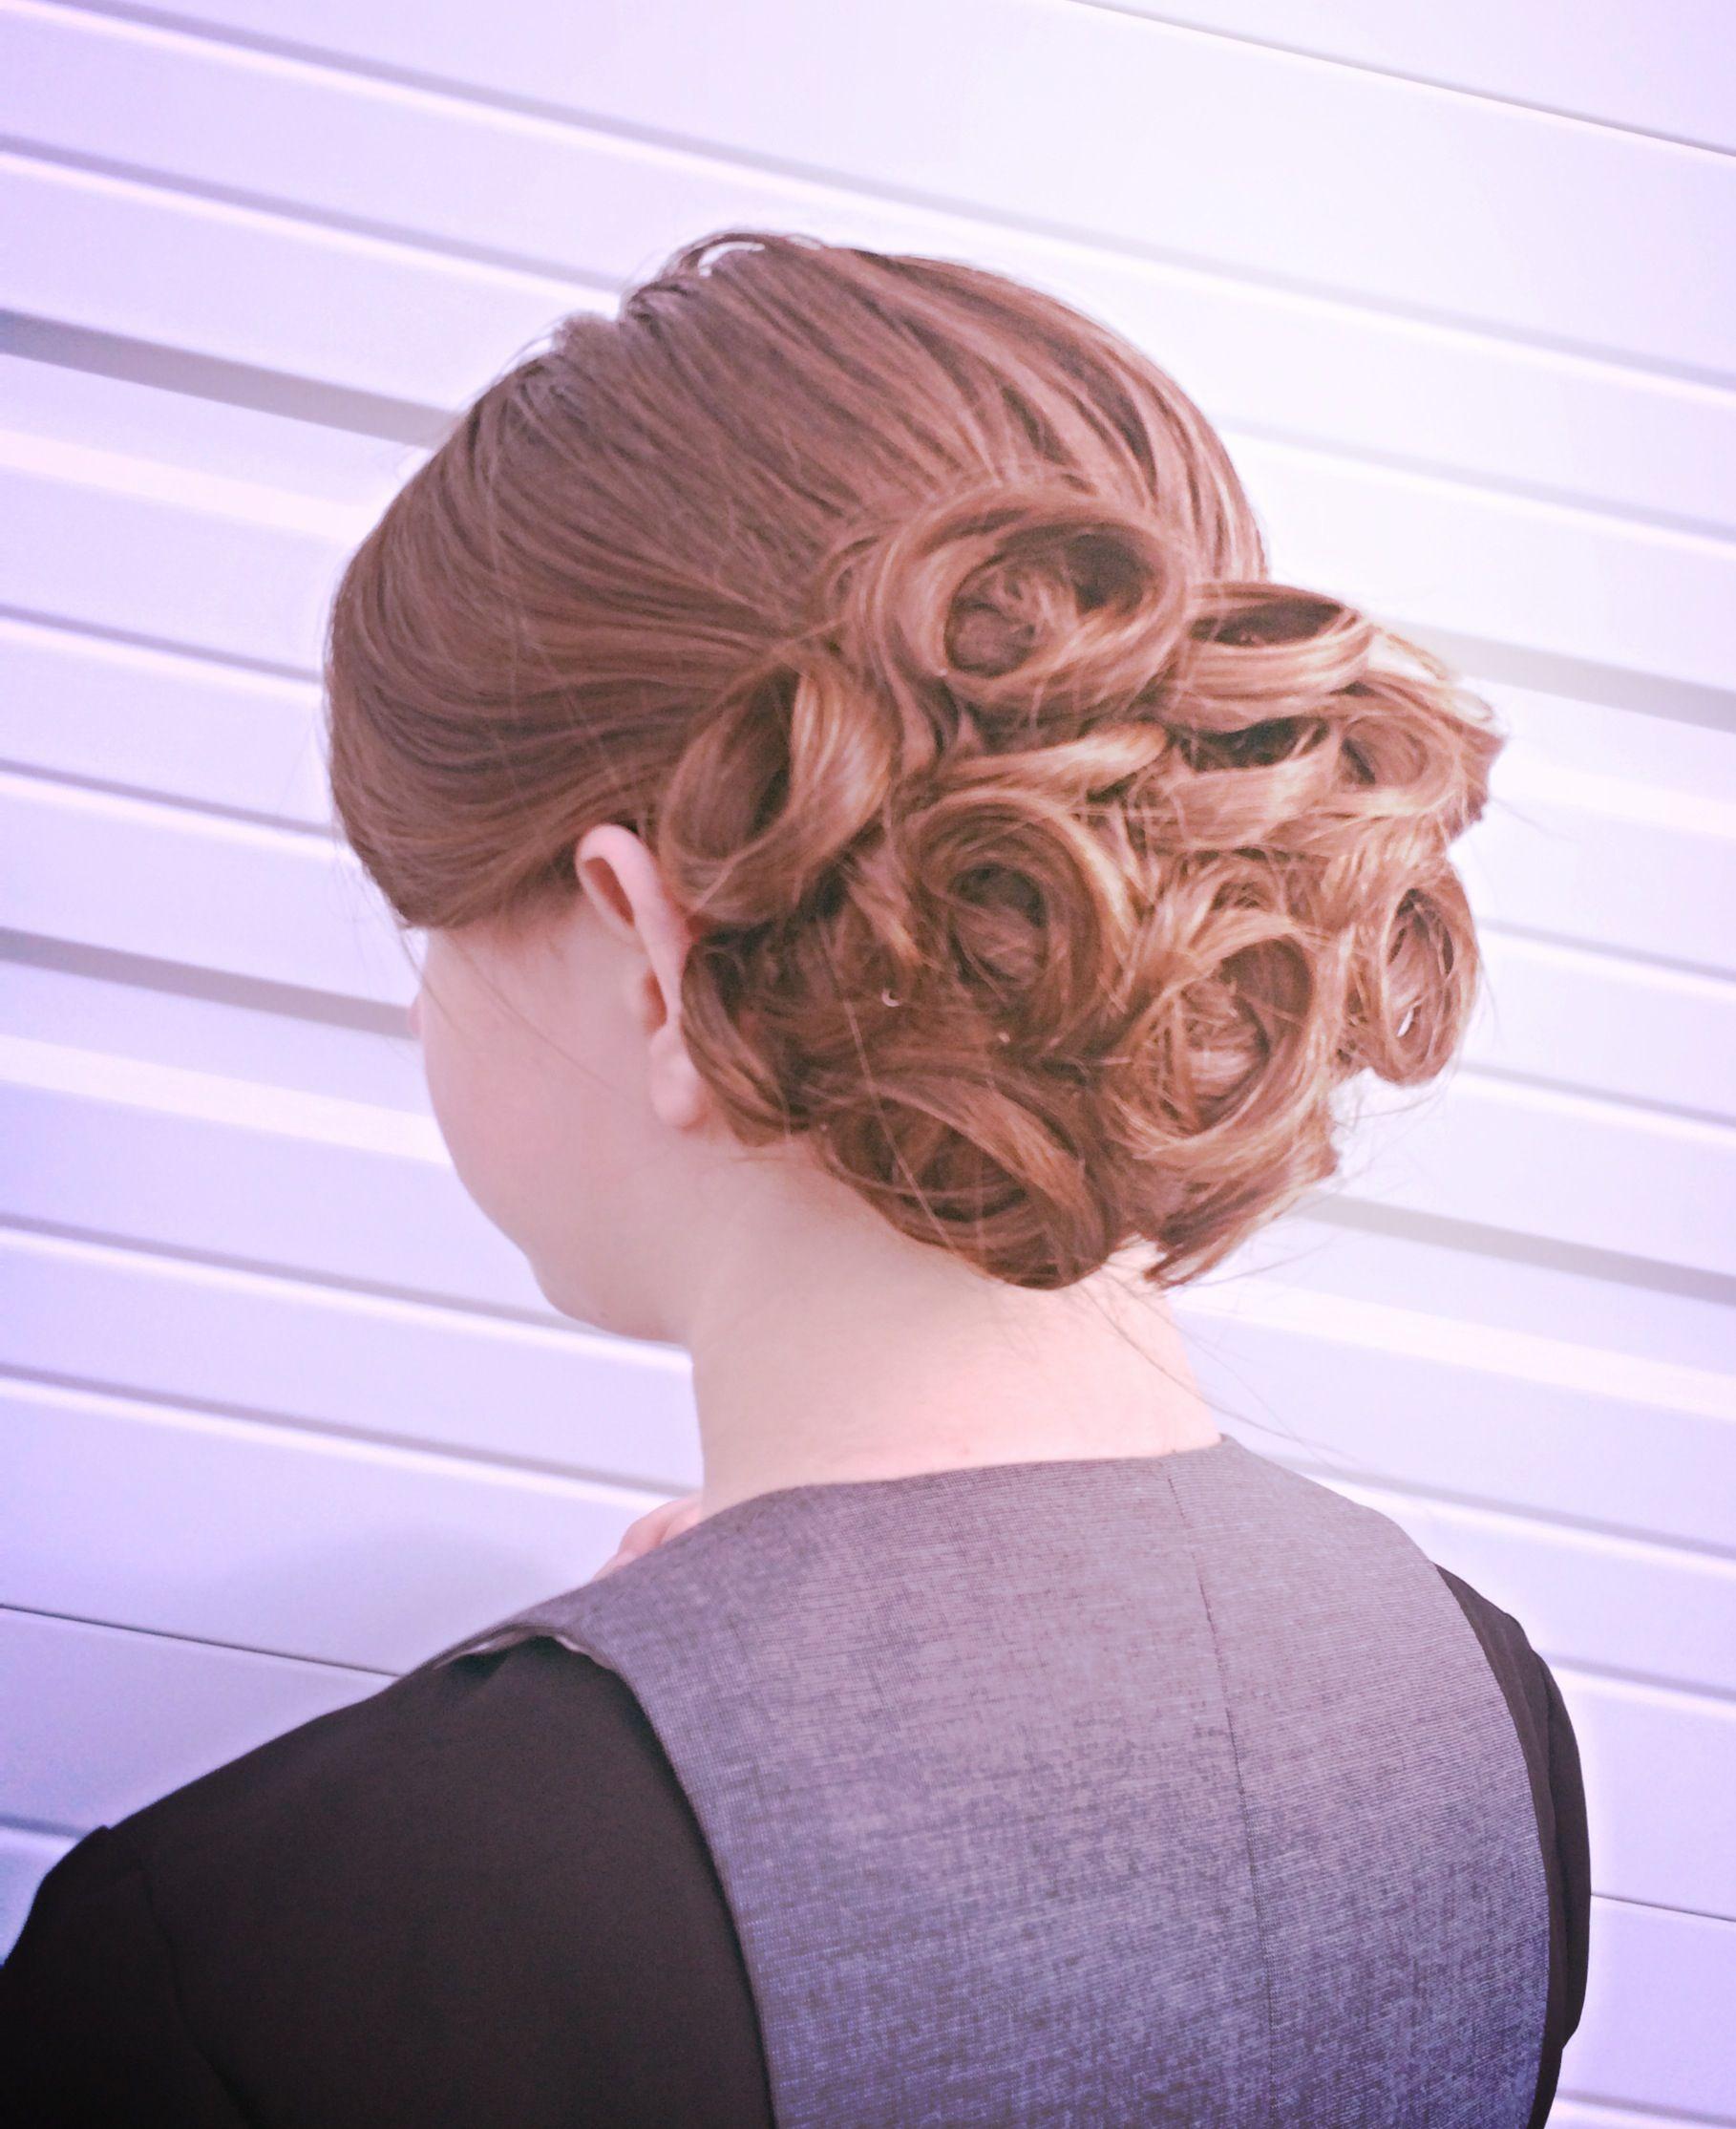 Pentecostal hair. By MaRaya Batts | long hair don't care :) | Pinter ...